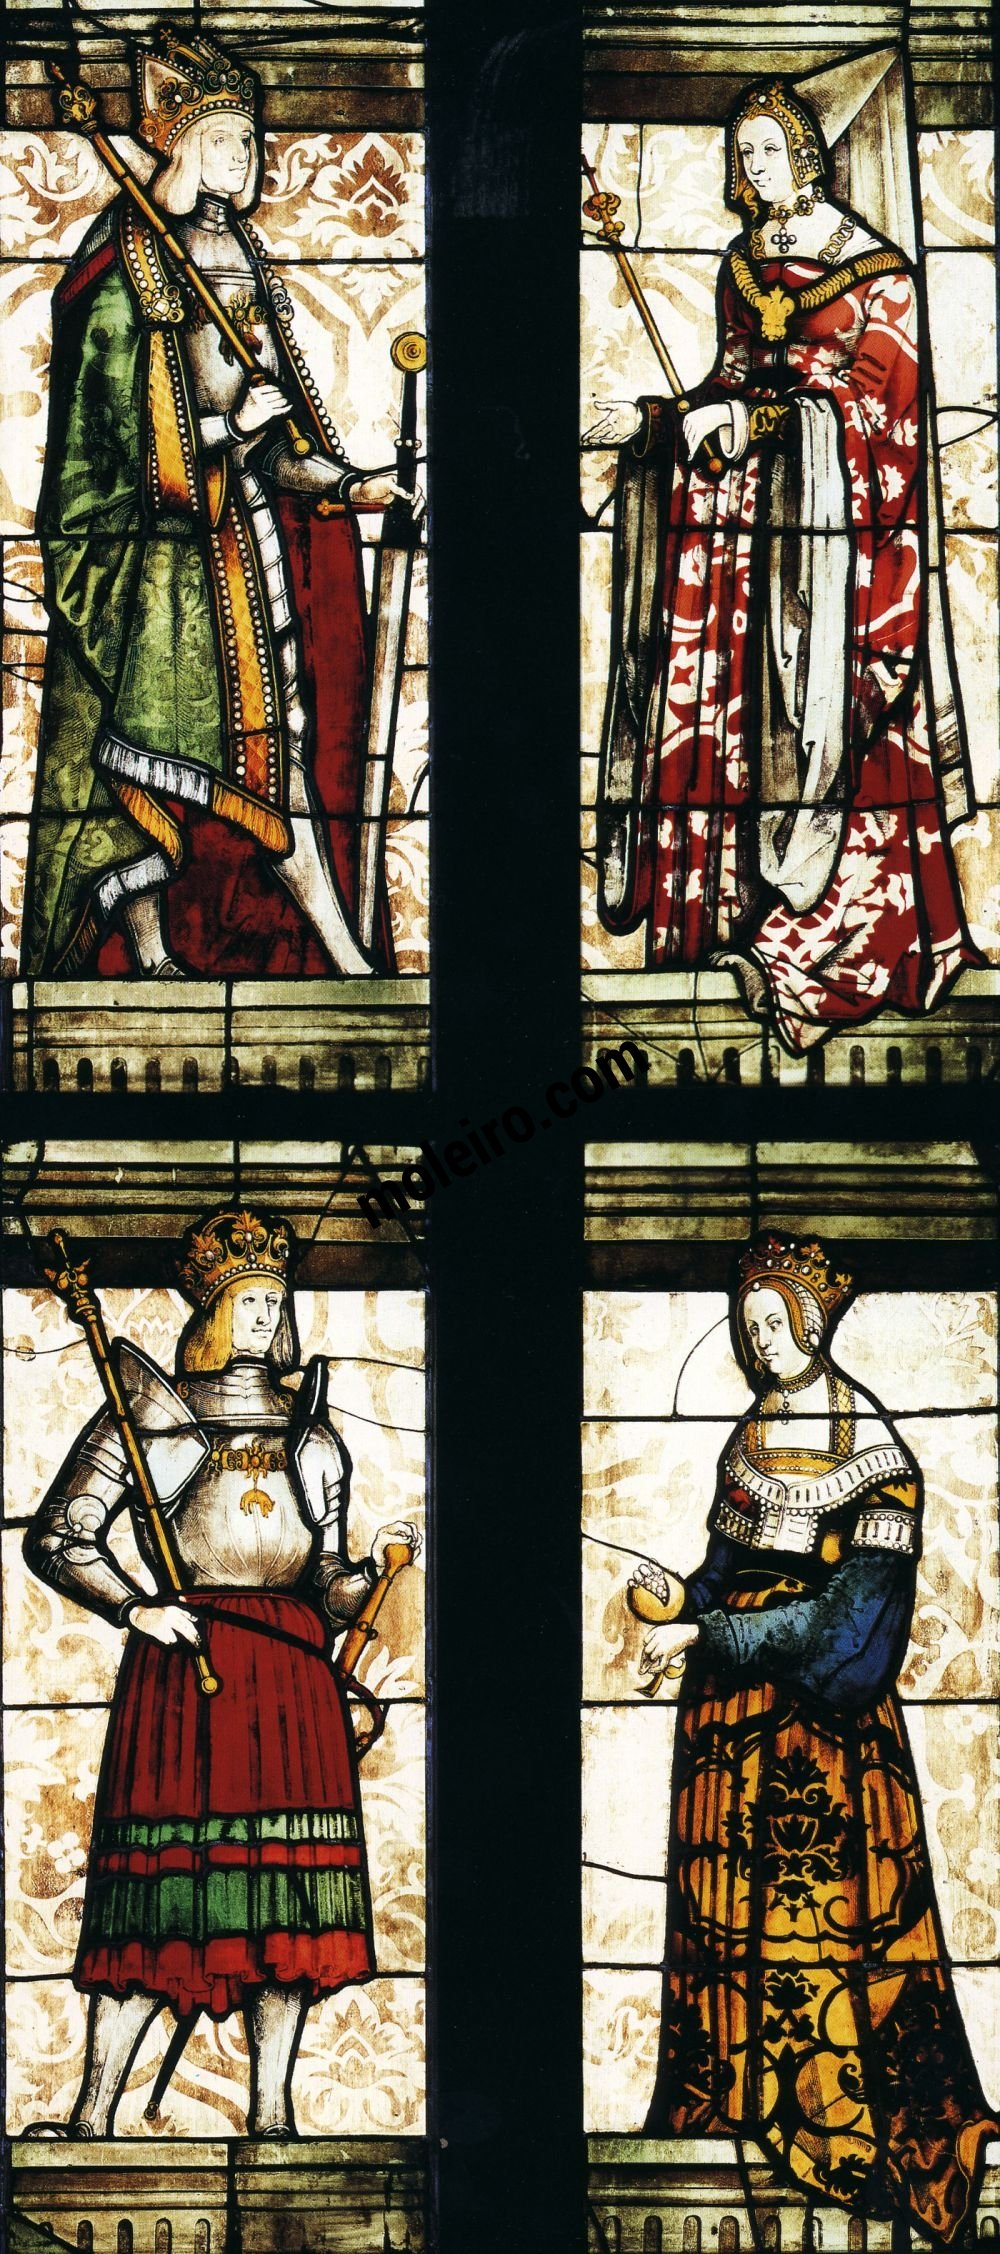 Talleres del Renacimiento Emperor Maximillian and Mary of Burgundy (top), Philip the Handsome and Joanna I of Castile (bottom), Veit Hirsvogel's workshop, Nuremberg, St Sebaldus, Emperor's glass window.